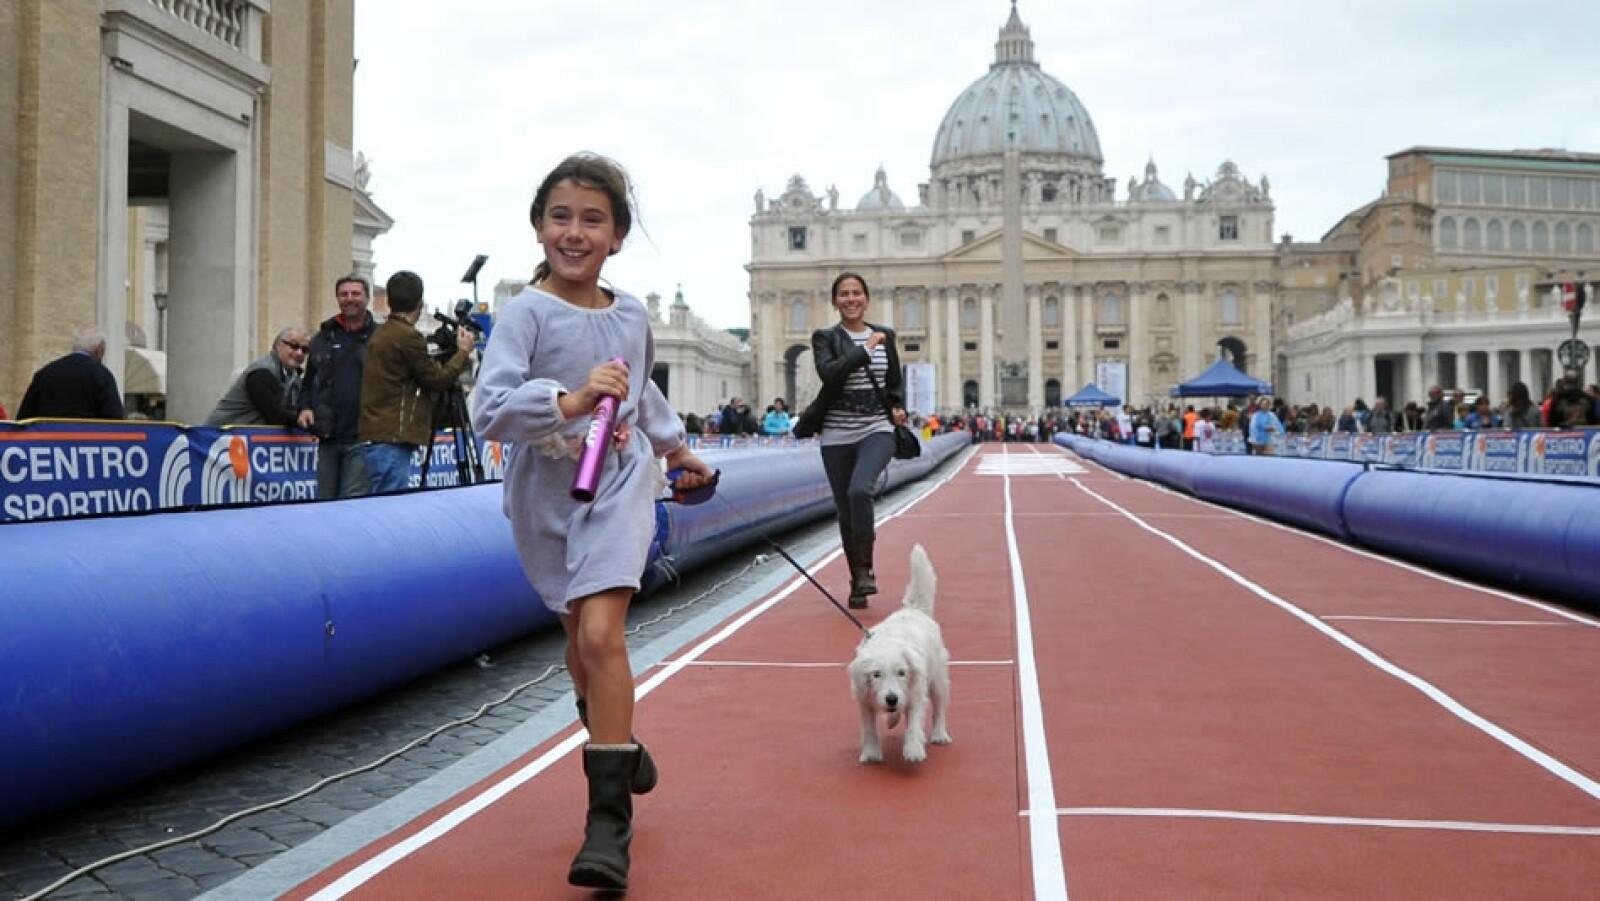 Carrera de la fe en el Vaticano